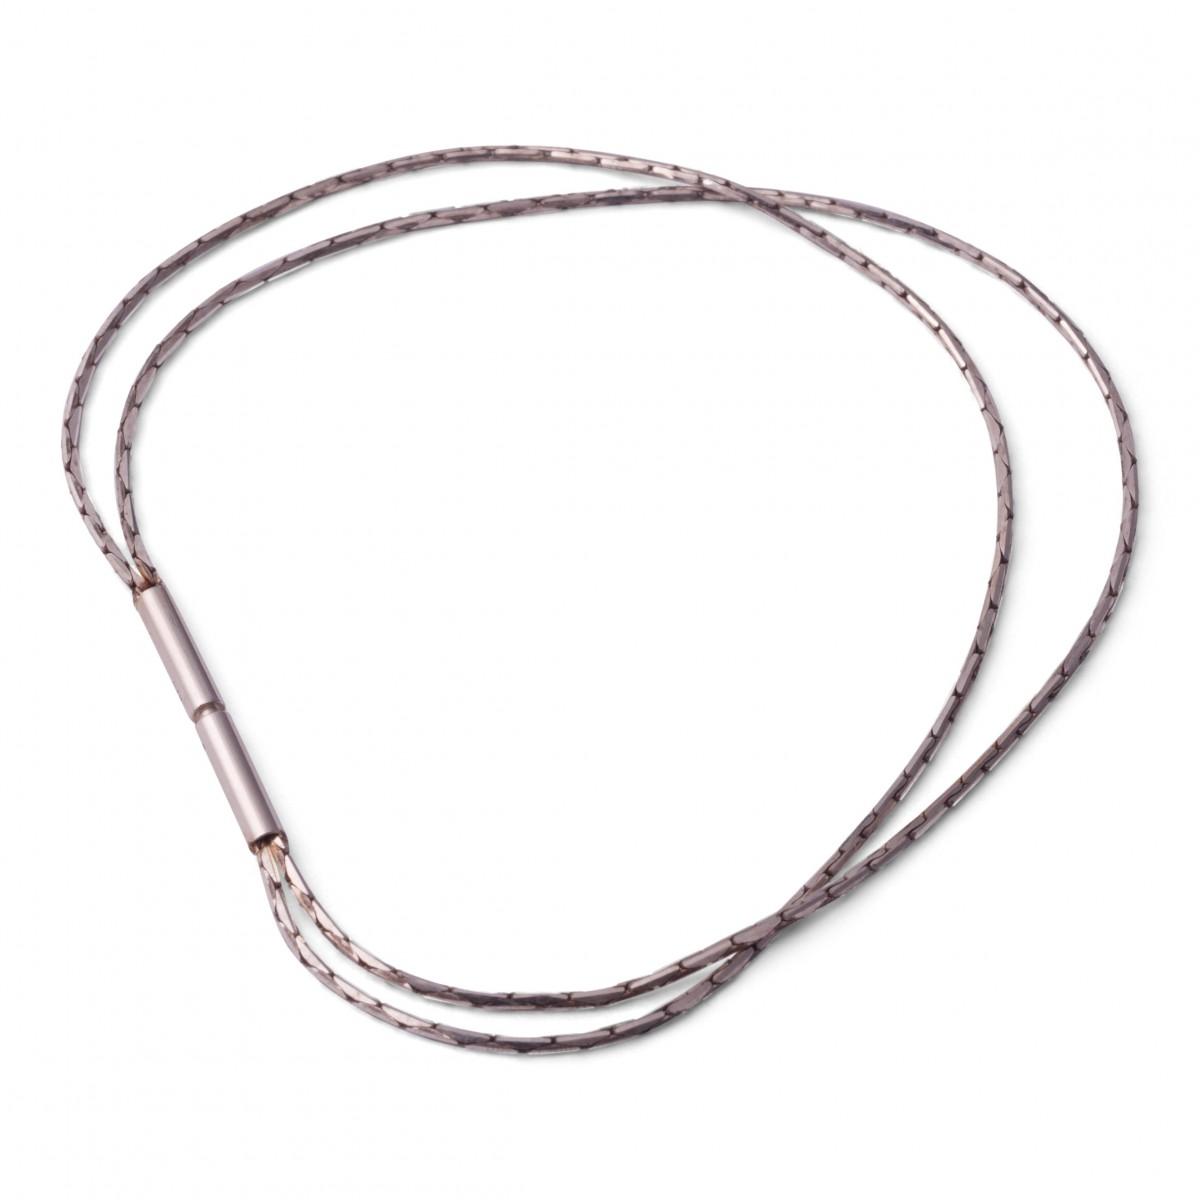 Comtesse de la Haye Doppel Kobra-Armband in  Silber oder Silber geschwärzt